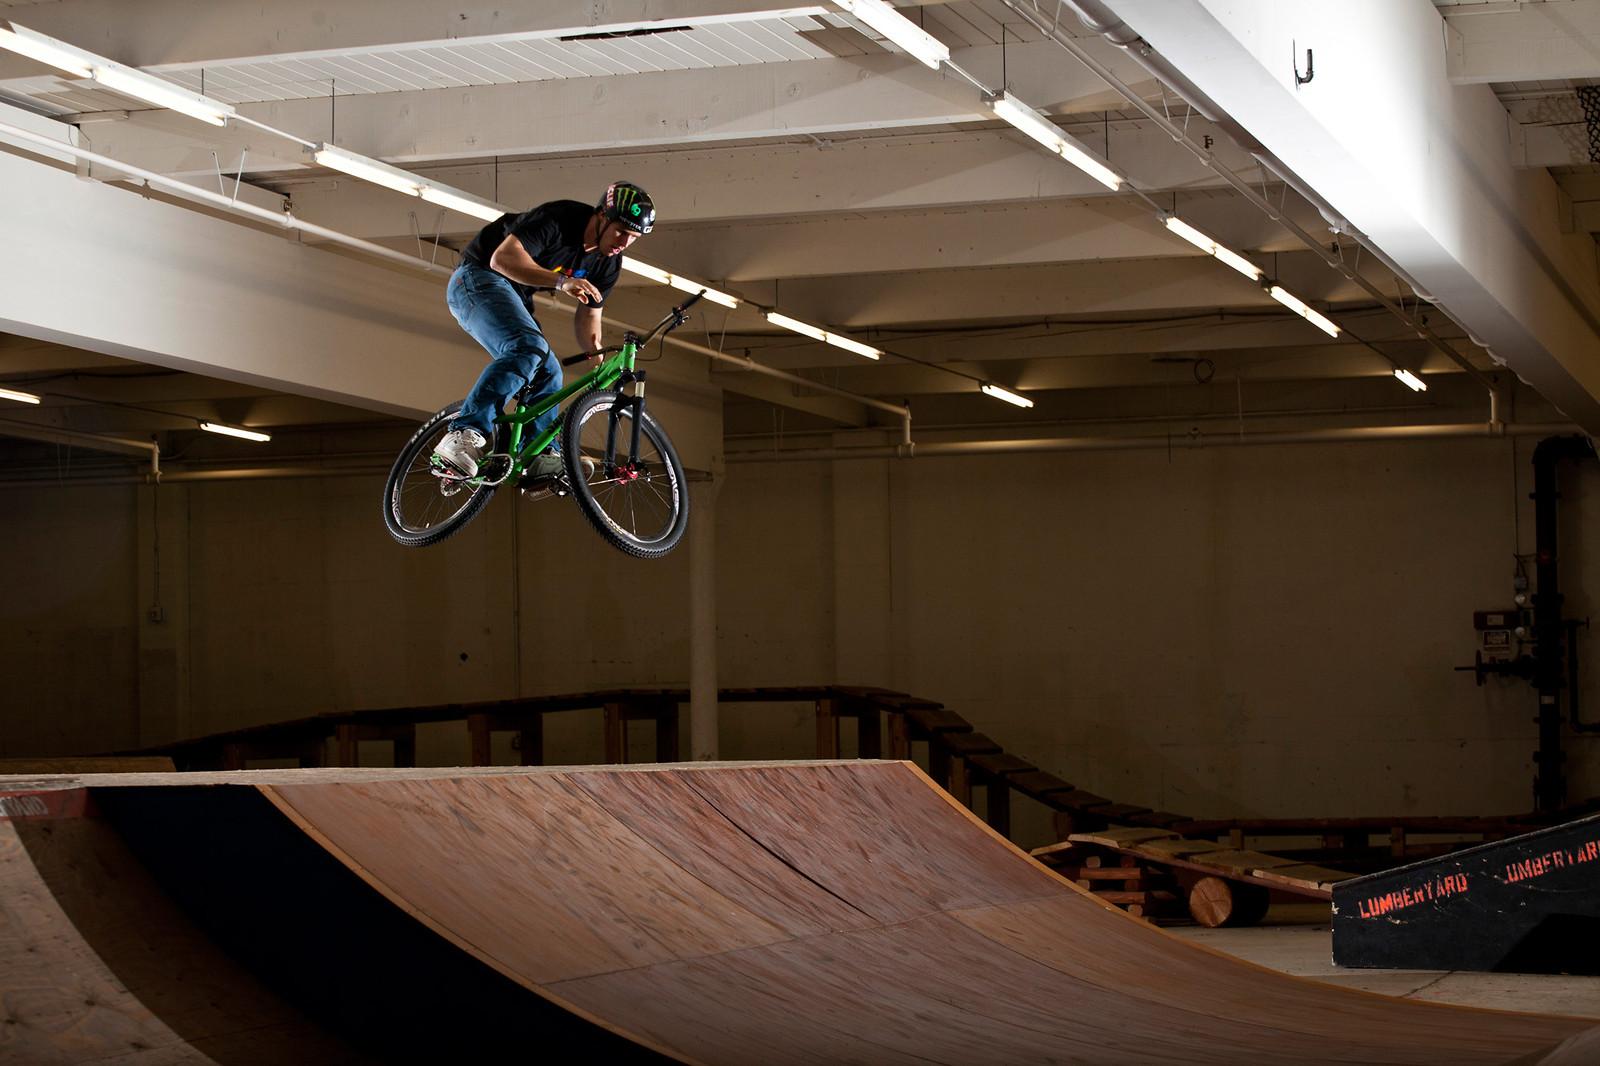 Jamie goldman lumberyard barspin - Jamie Goldman - Mountain Biking Pictures - Vital MTB